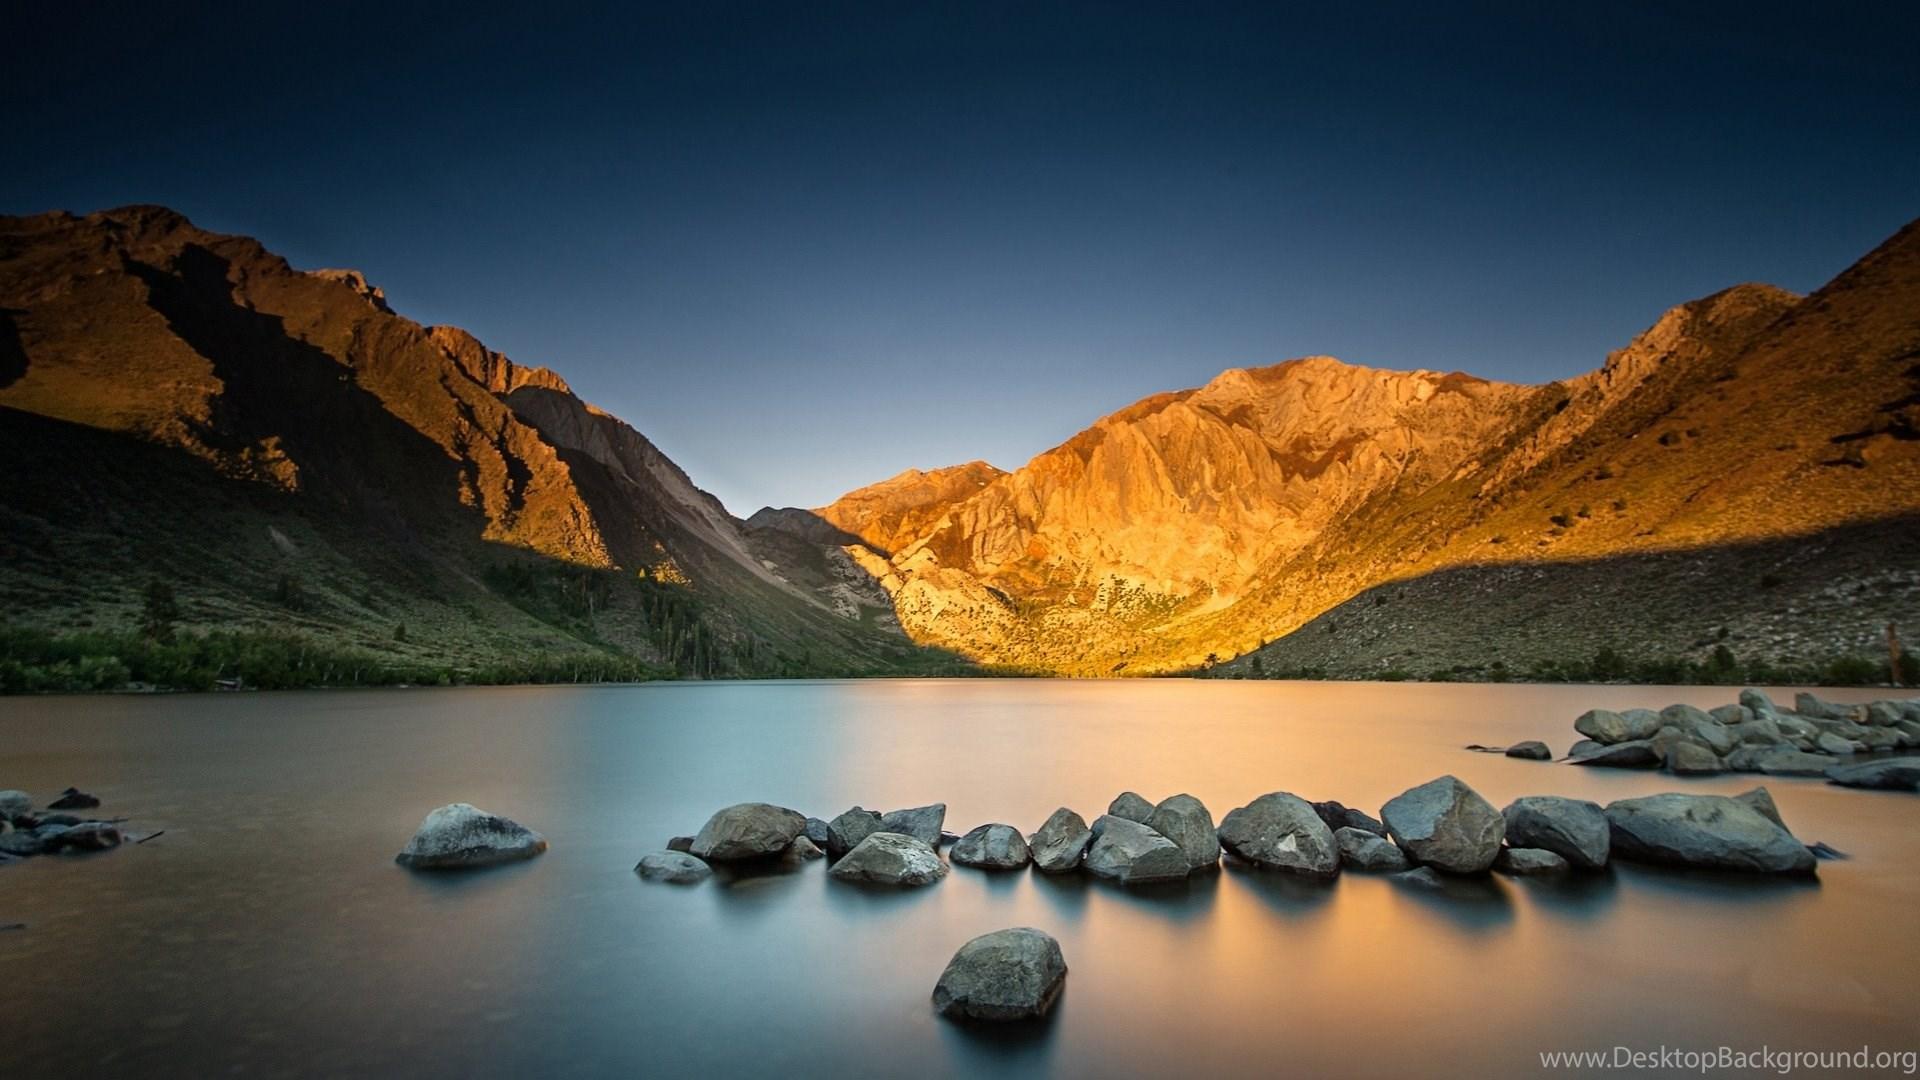 Mountain Sunrise Wallpaper Desktop Background